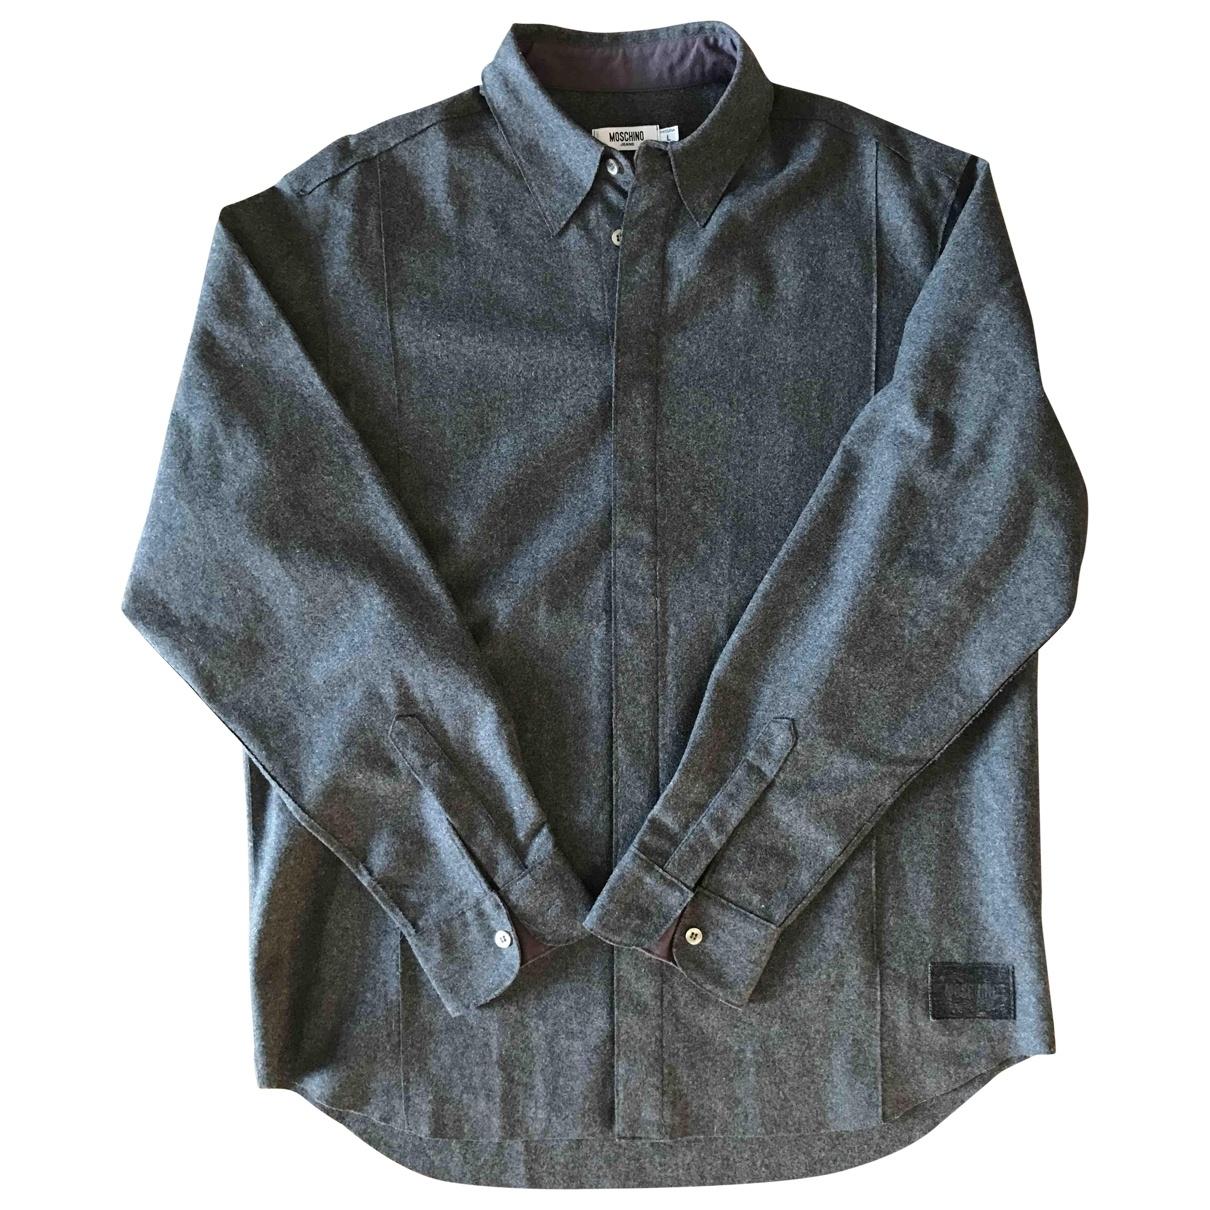 Moschino - Chemises   pour homme en laine - anthracite